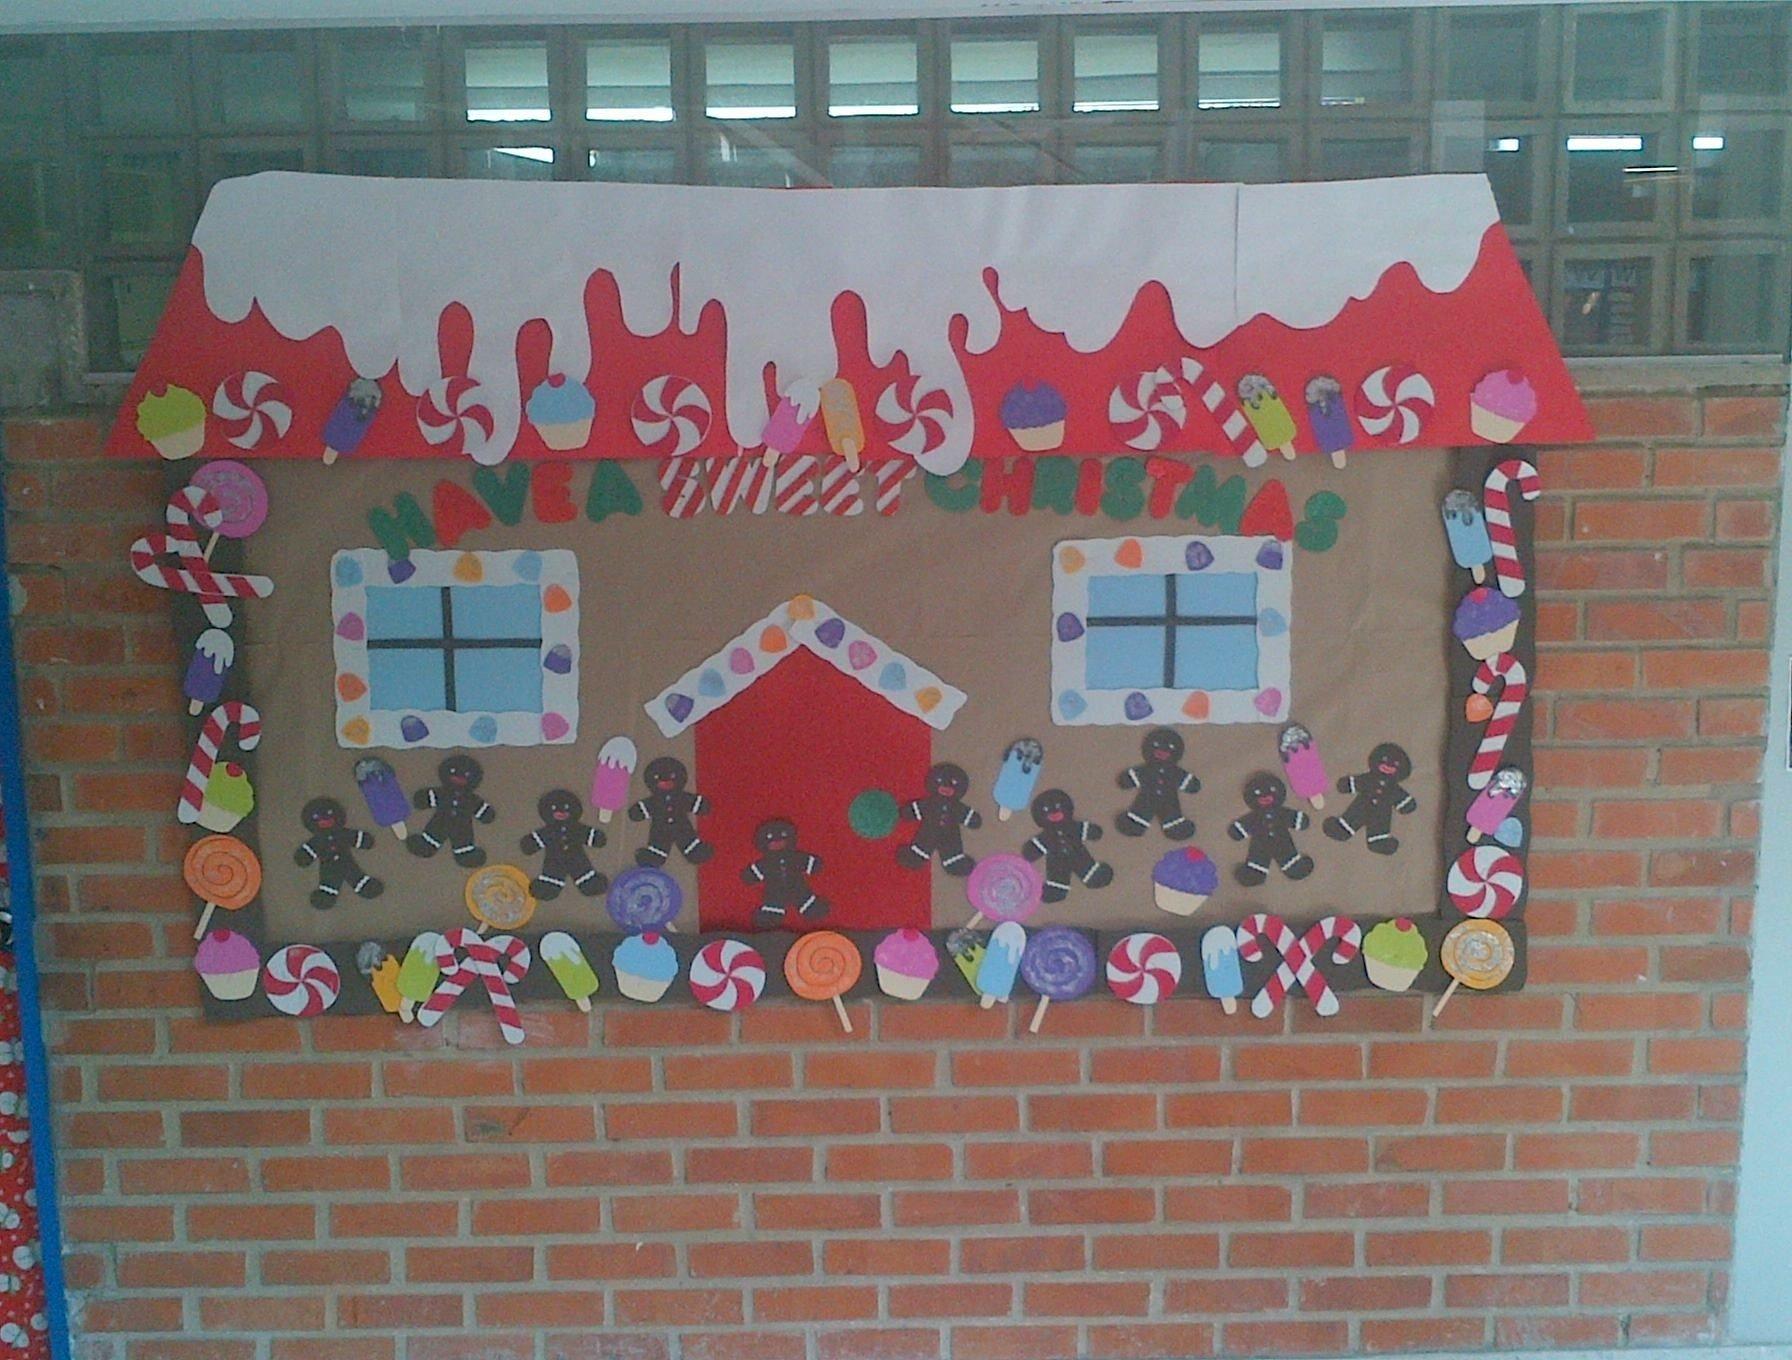 10 Lovable Christmas Bulletin Board Ideas For Teachers christmas bulletin boardjust make the b board into the house 1 2020